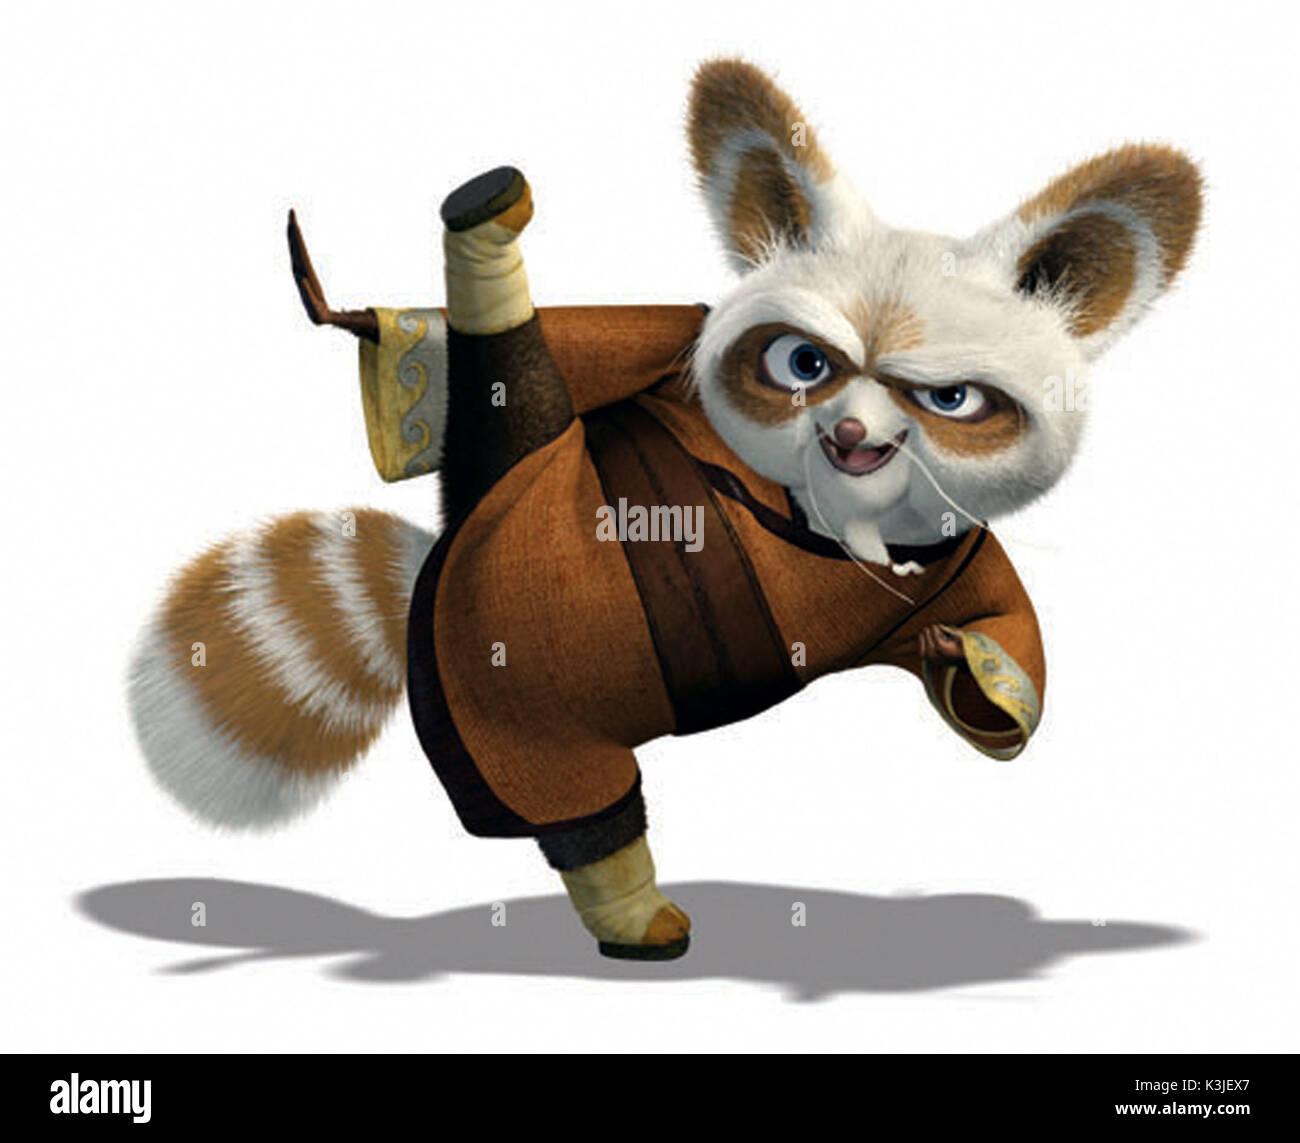 Kung fu panda dustin hoffman voix ma tre shifu kung fu - Maitre kung fu panda ...